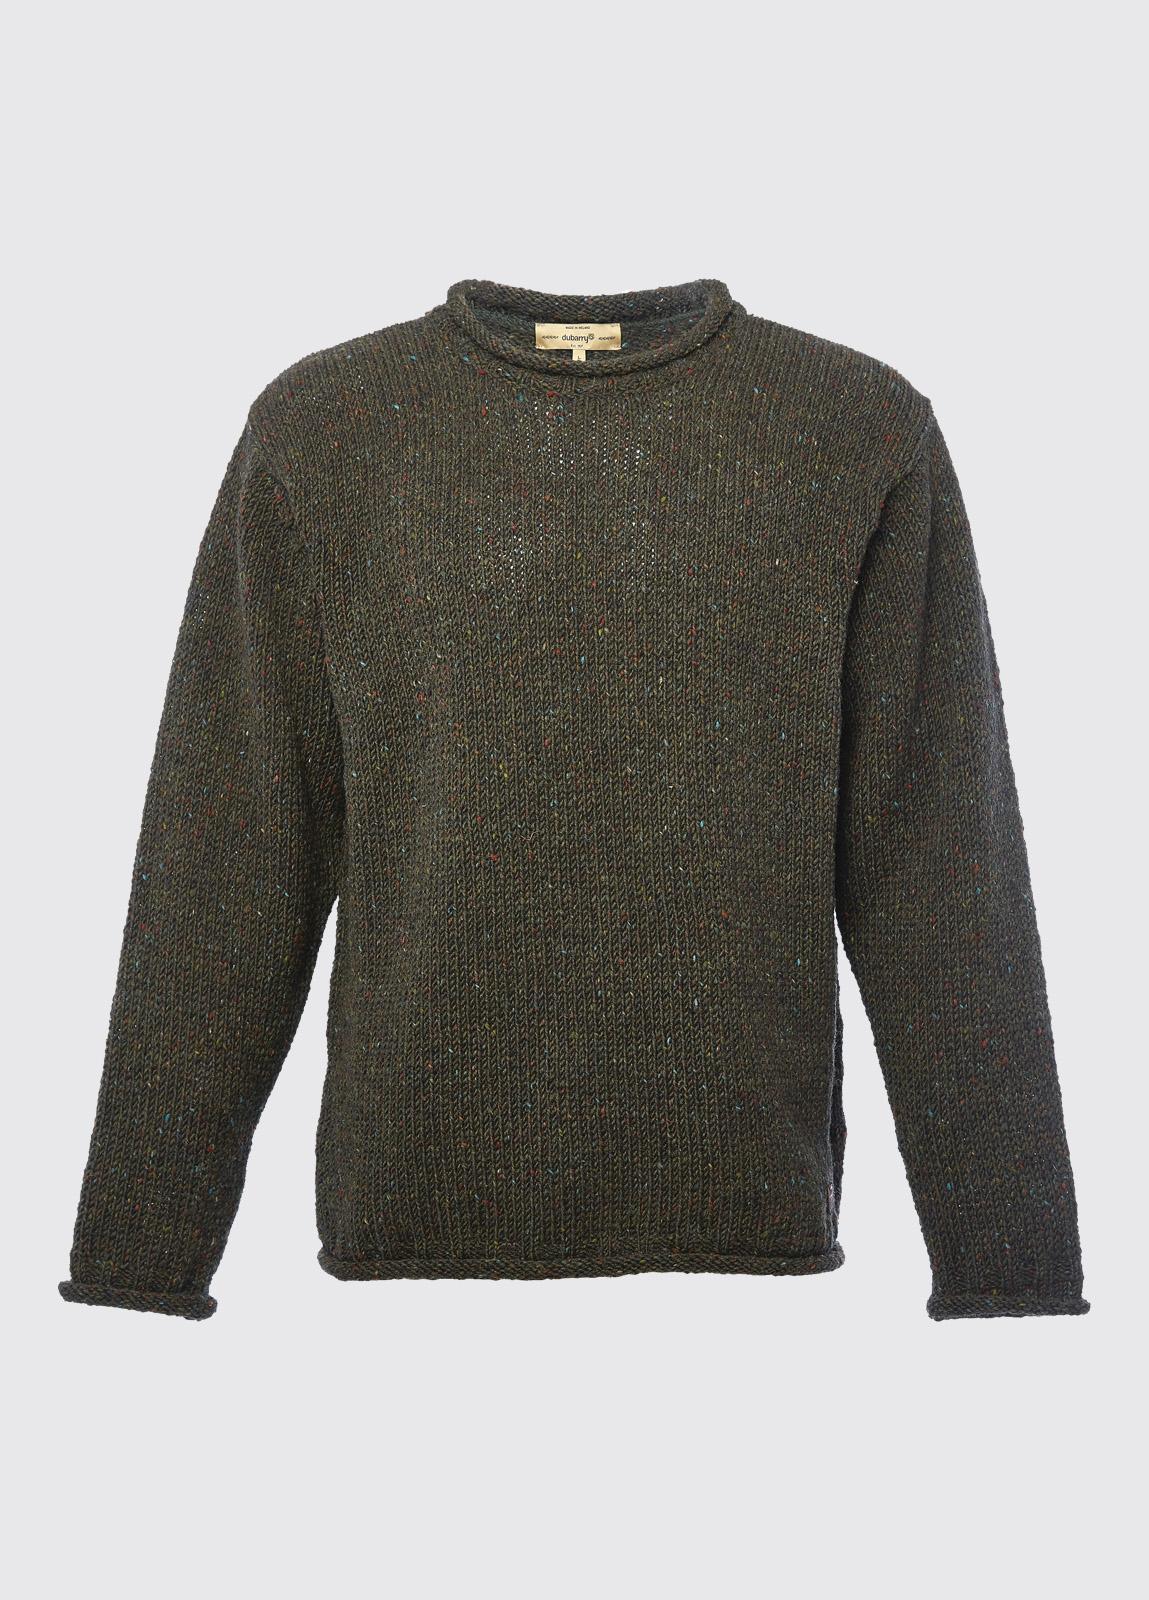 Marshall Crew Neck Sweater - Olive